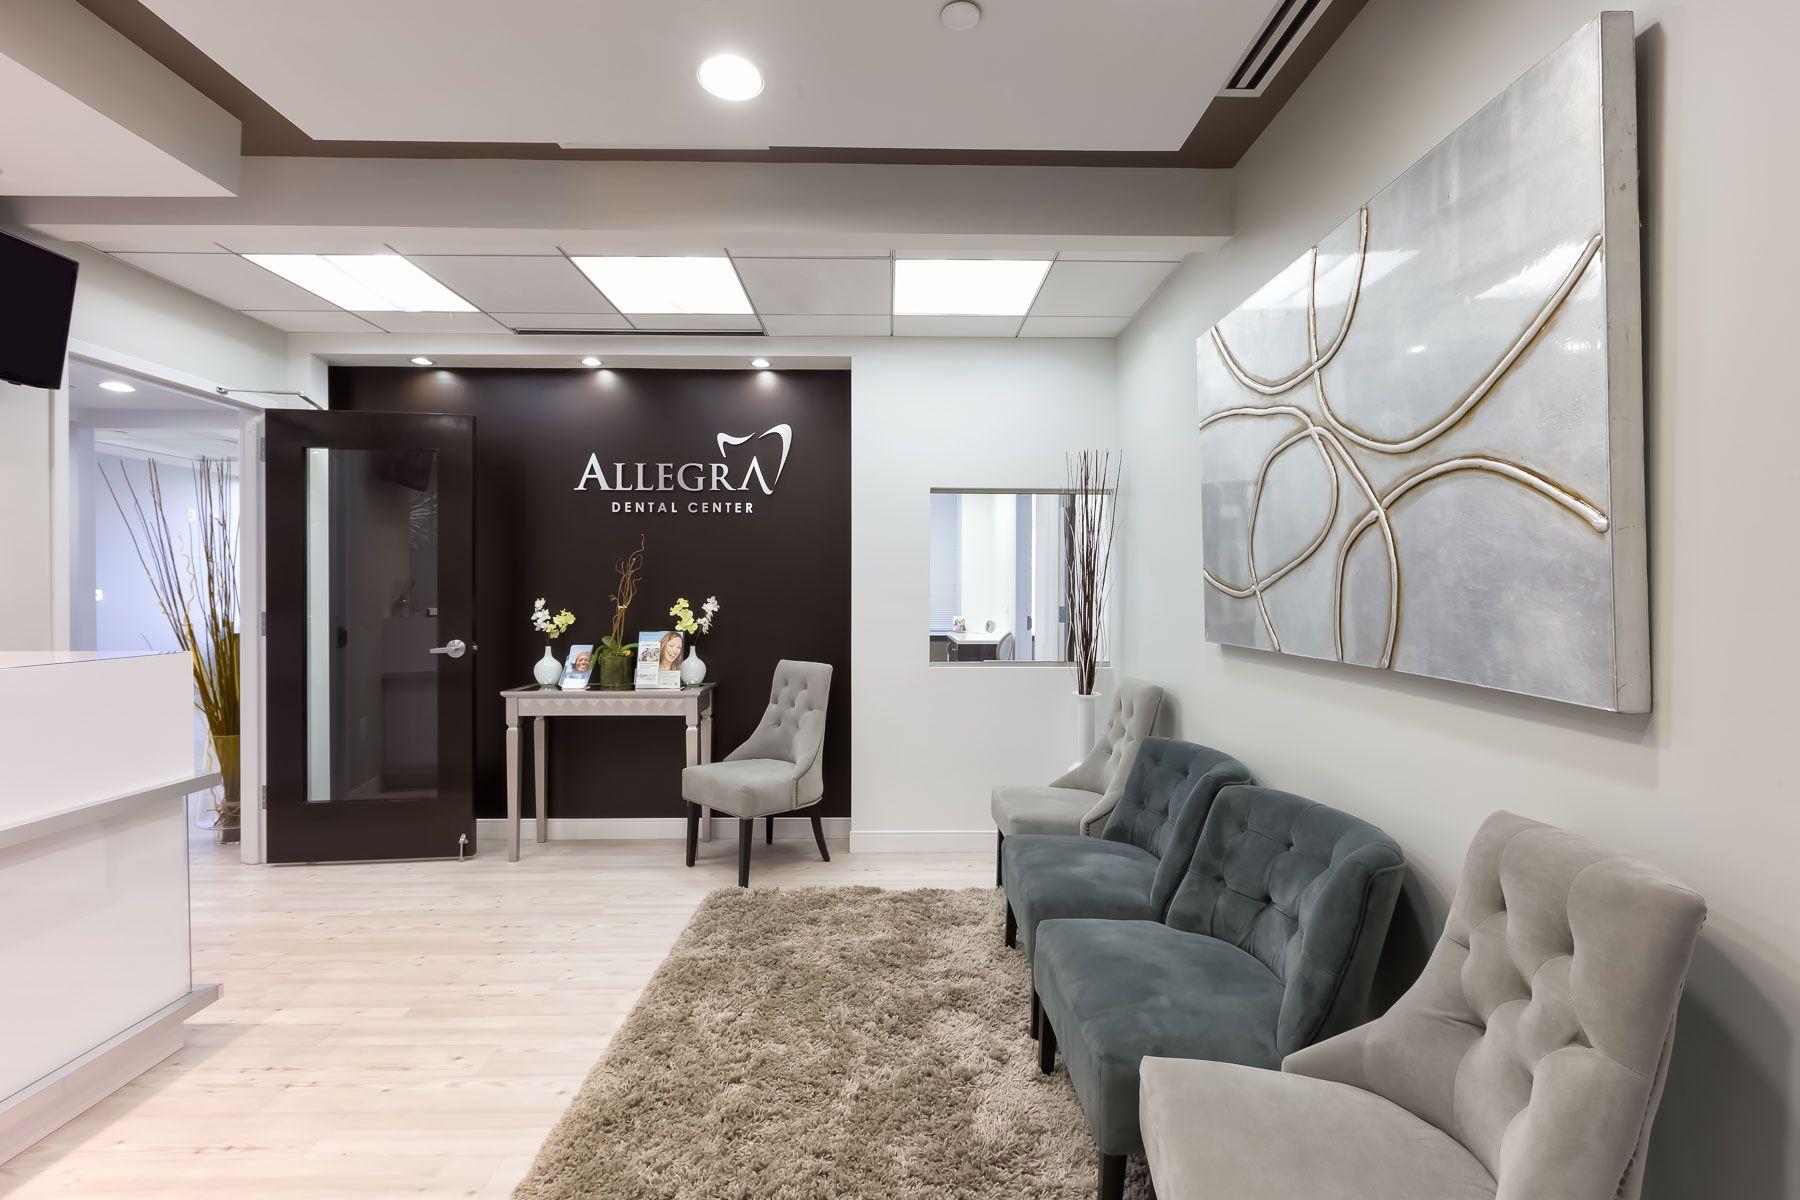 Allegra Dental Center Architecture Design And Construction In Fairfax Virginia Reception Area